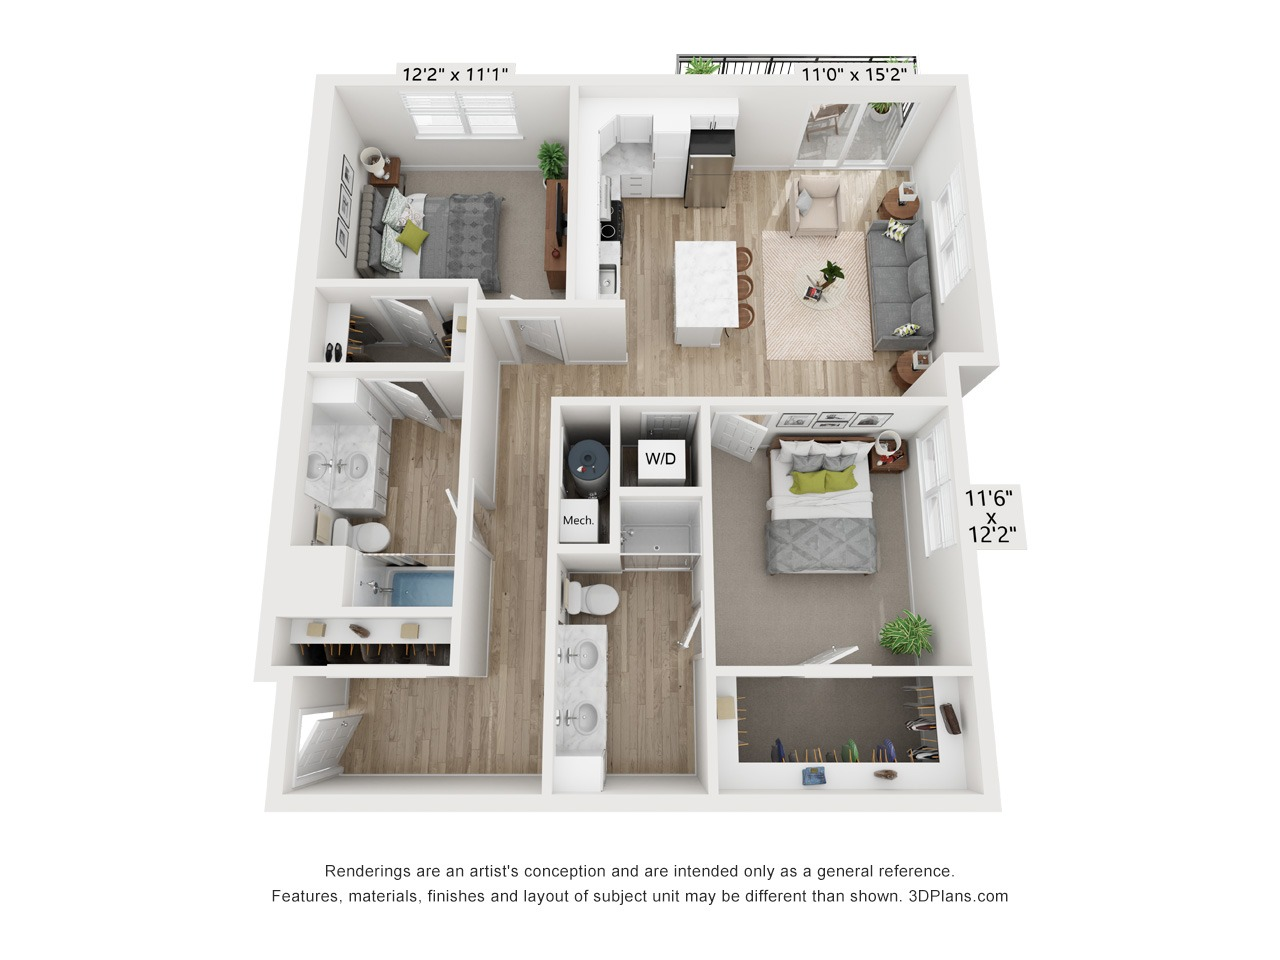 2 Bedroom 2 Bathroom - 1,080 to 1,188 SF